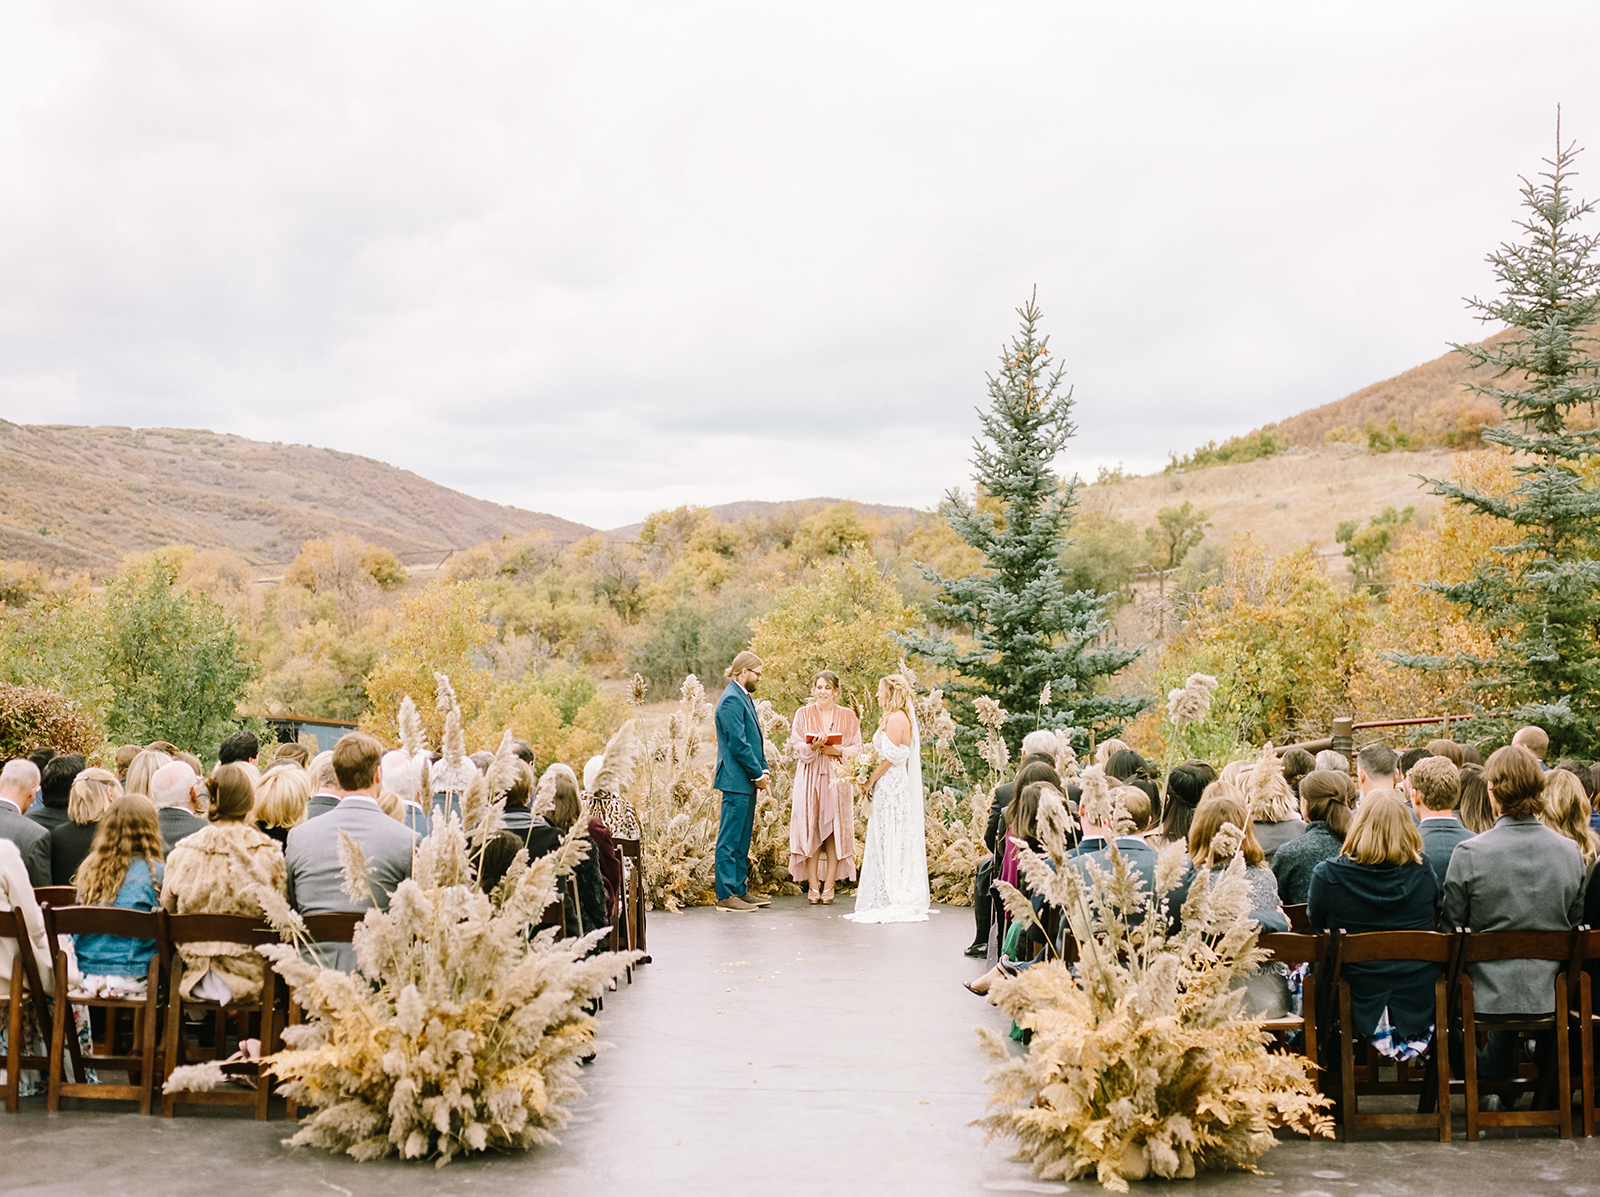 kate_jack_film_wedding_0151_bw.jpg